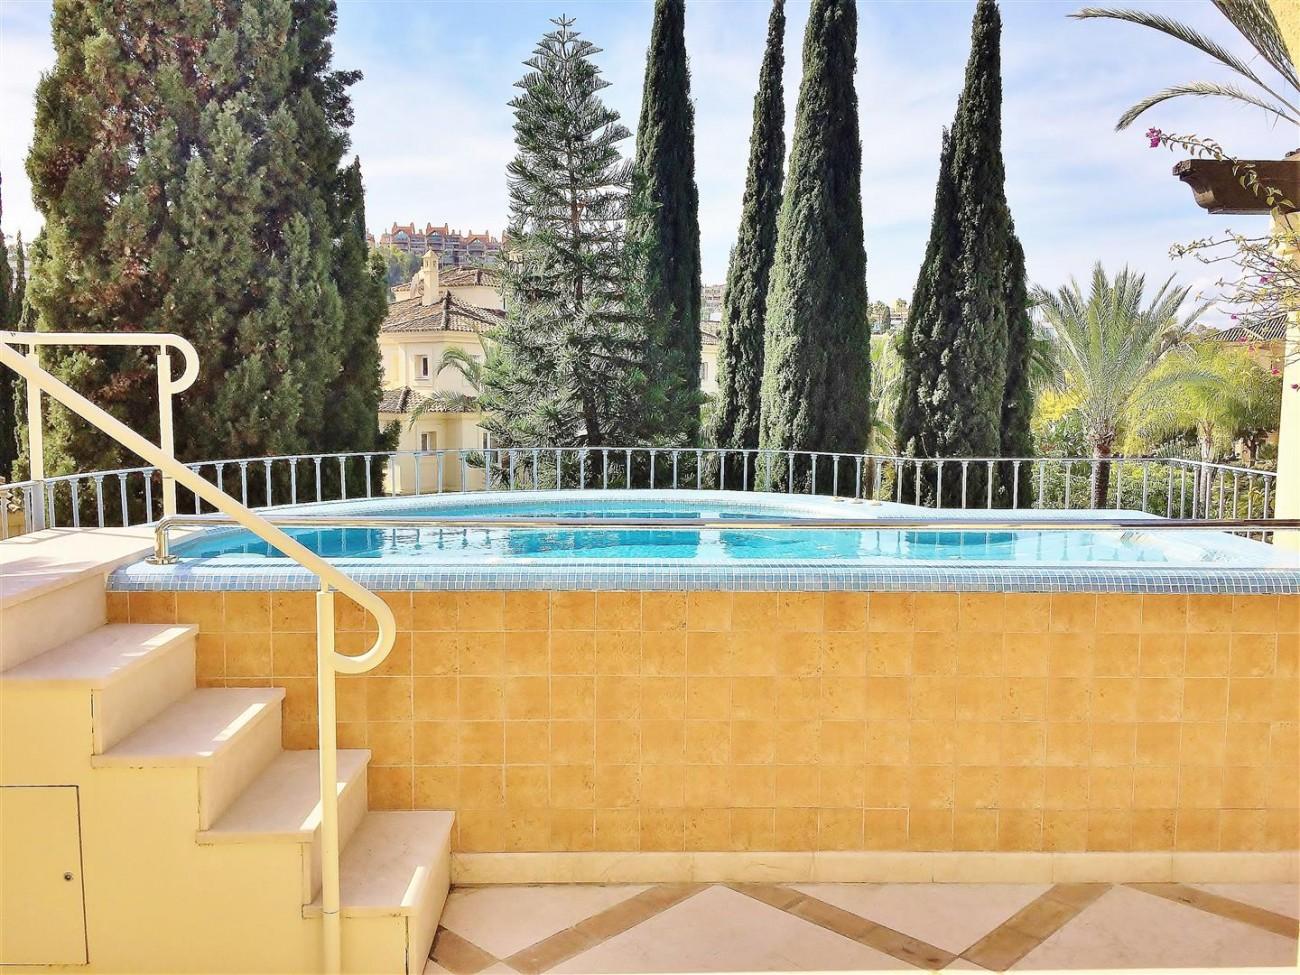 Penthouse for sale Las Alamandas Nueva Andalucia Marbella Spain (15) (Large)